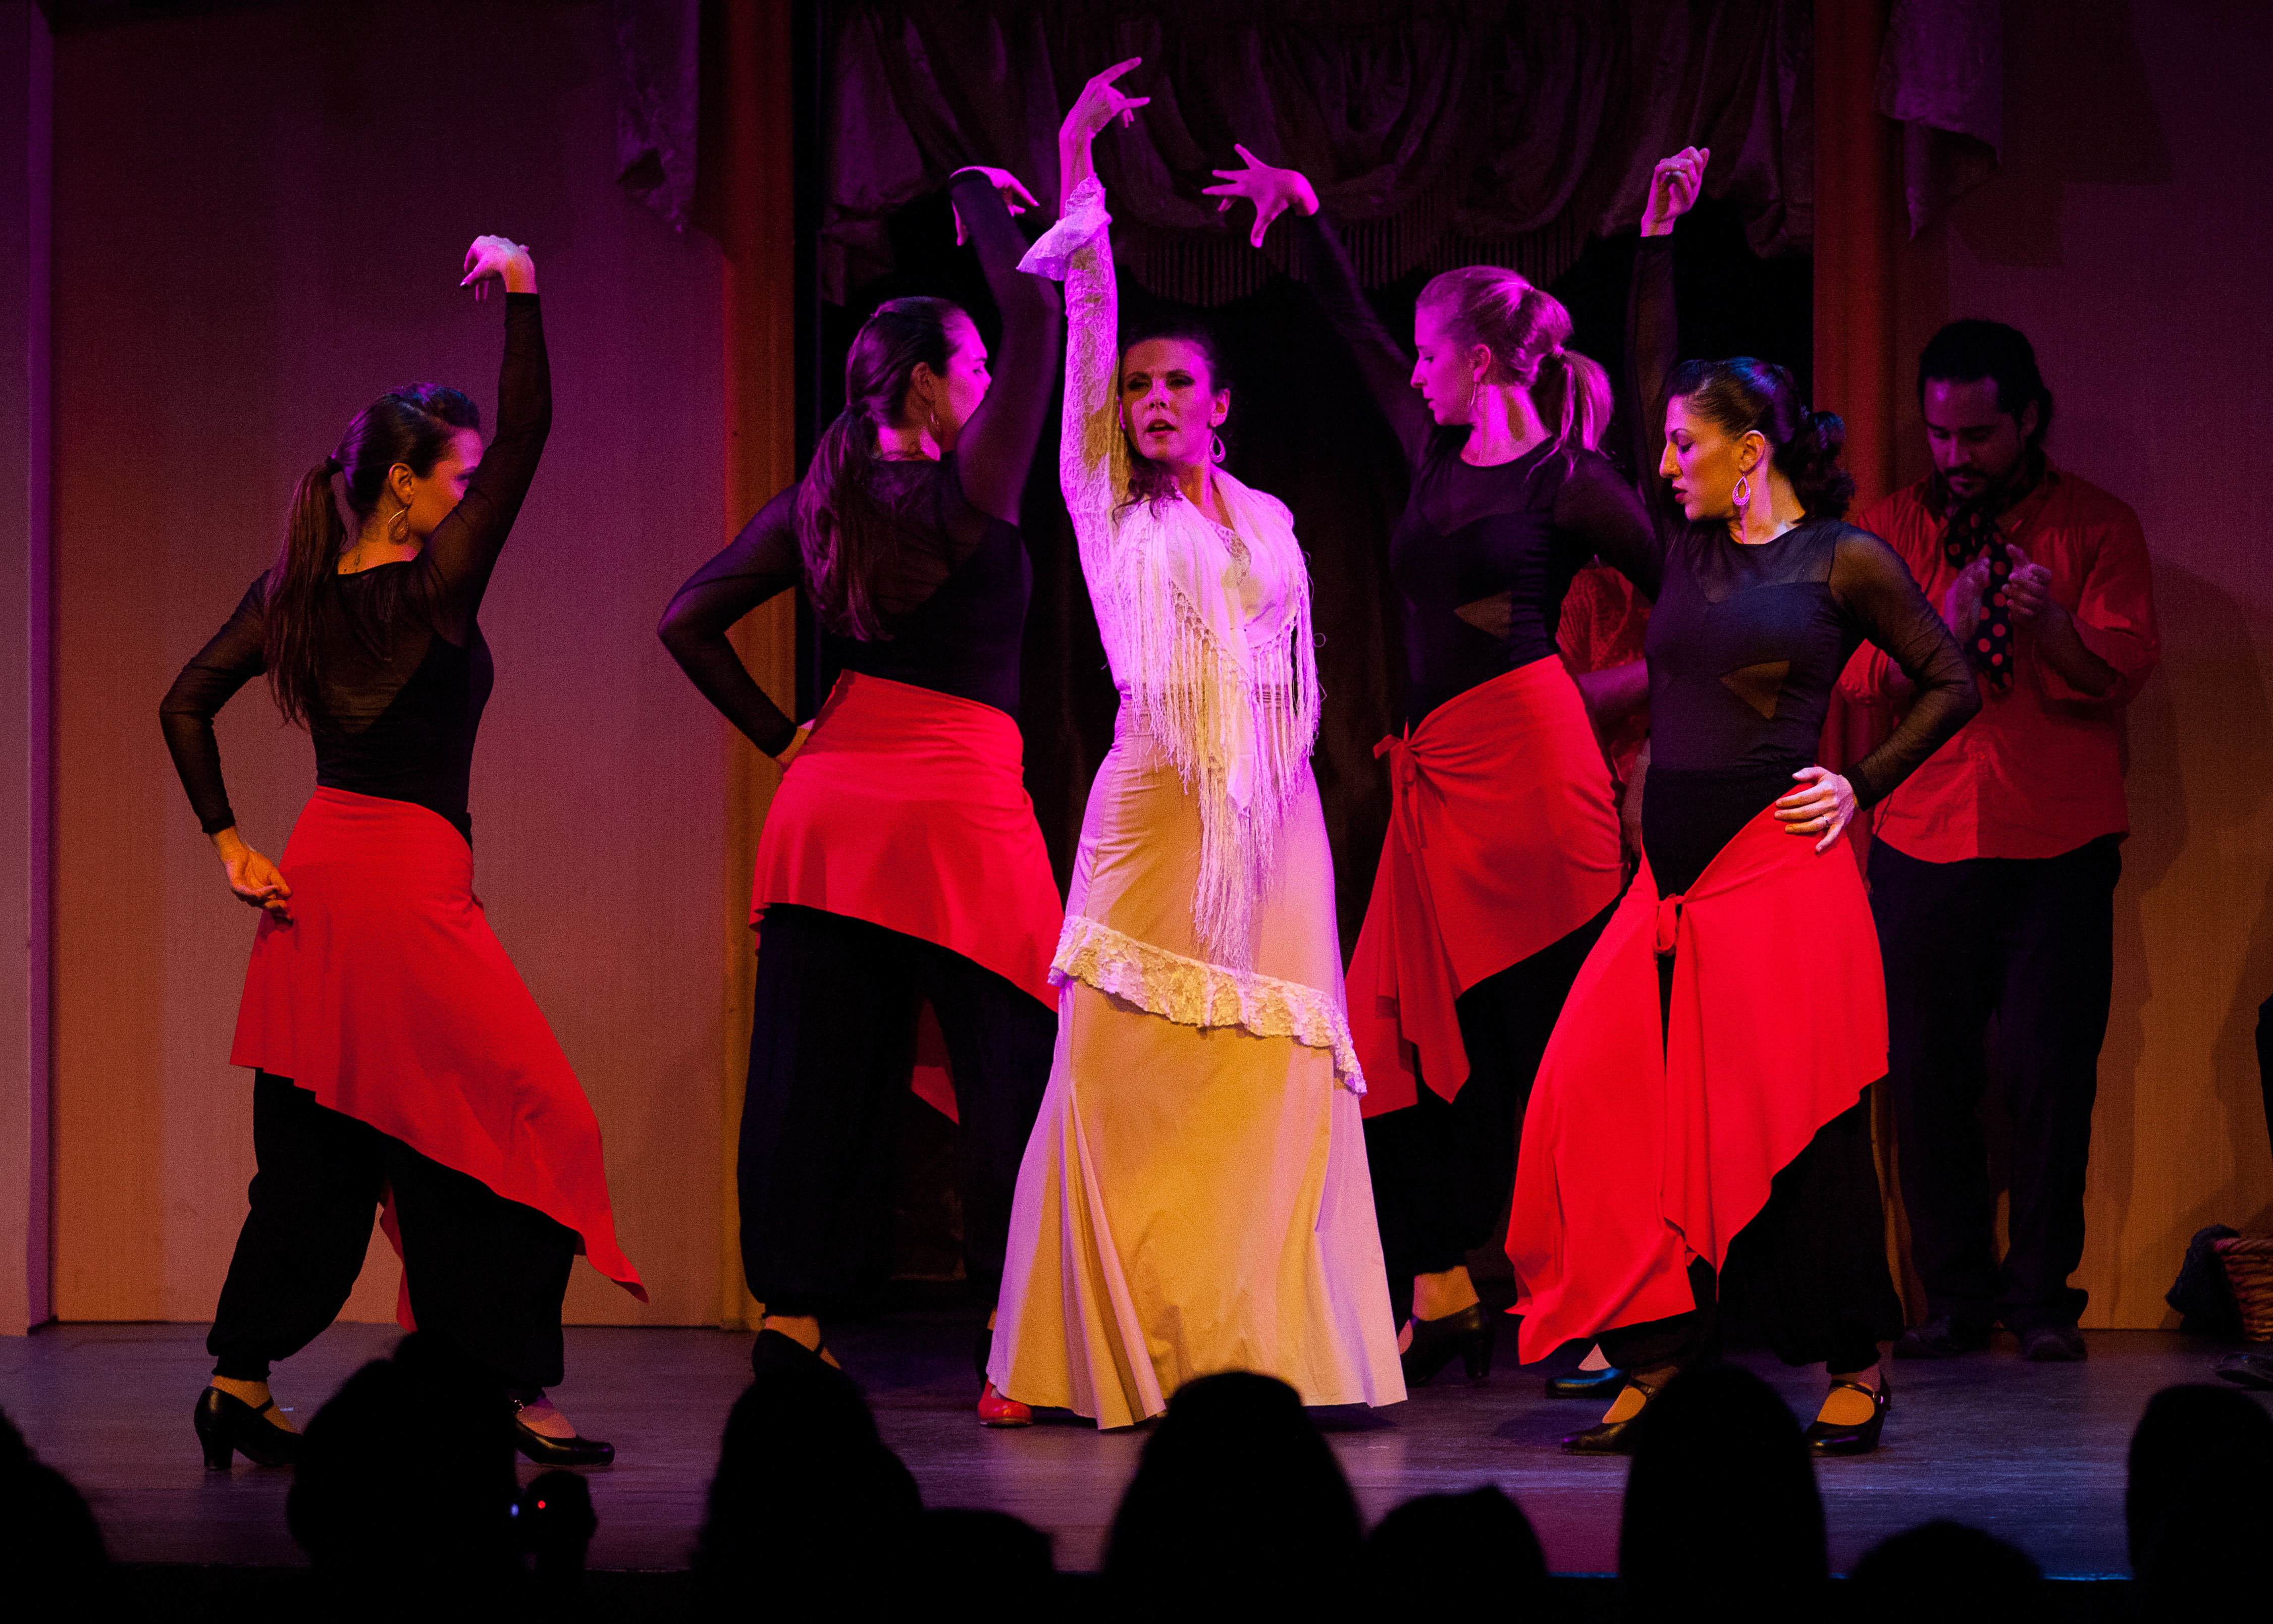 in flamenco looks can be deceiving